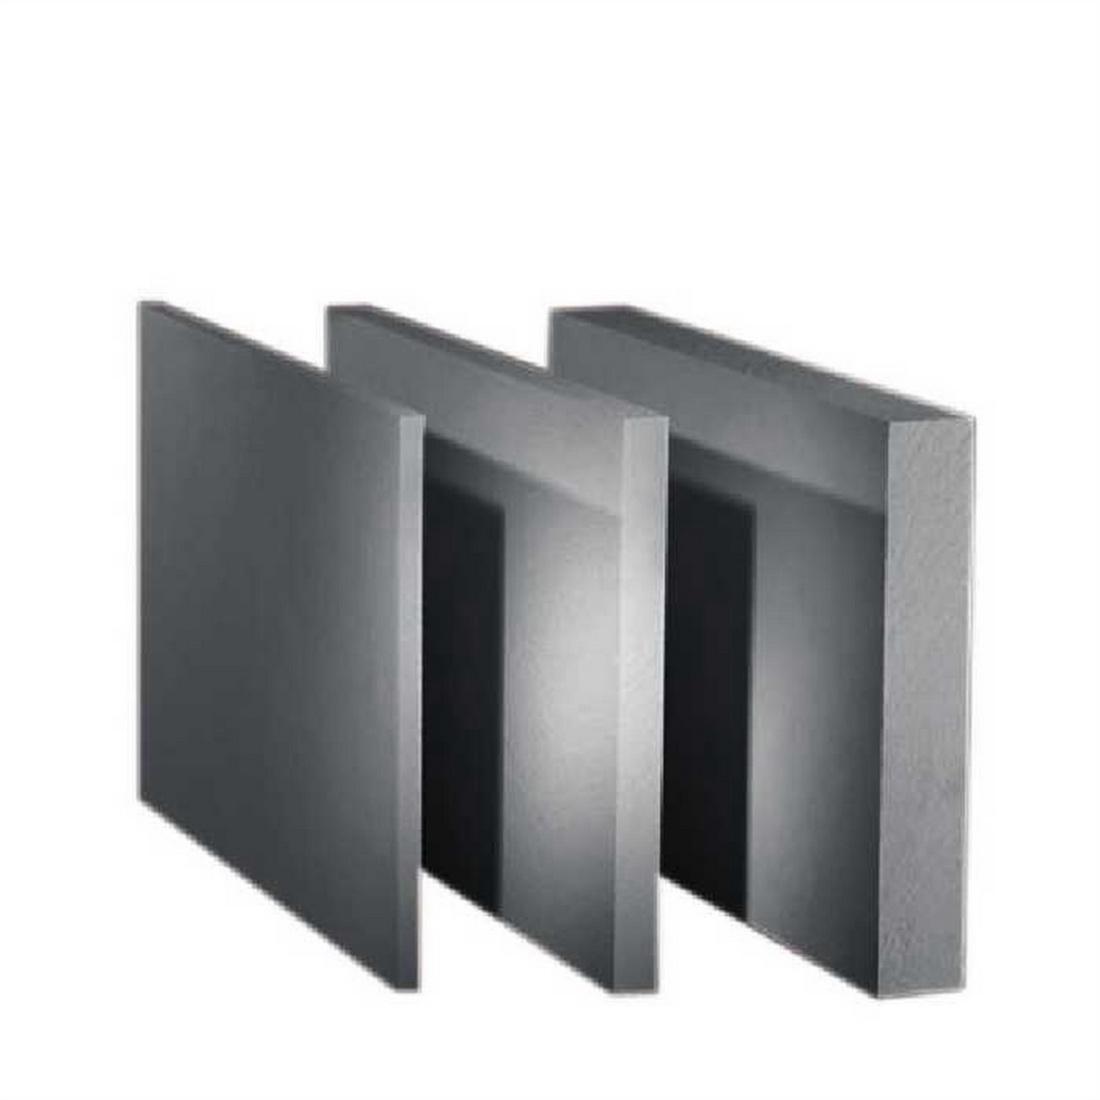 Expol Platinum Board 2400 x 1200 x 30mm R0.94 Black Expanded Polystyrene N2430